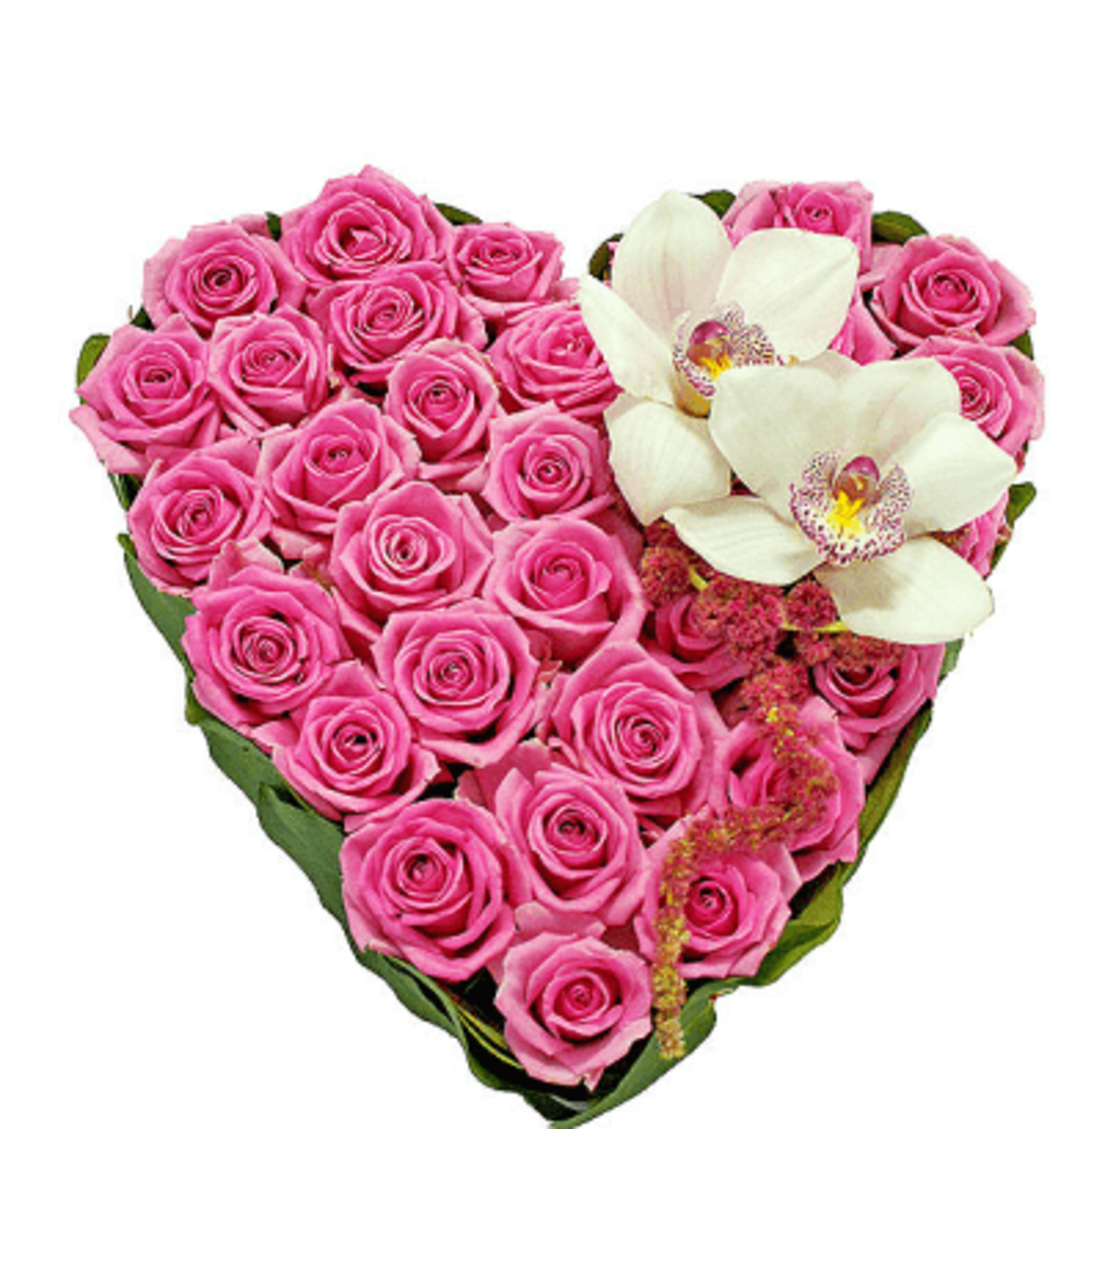 Рожева мрія. Superflowers.com.ua